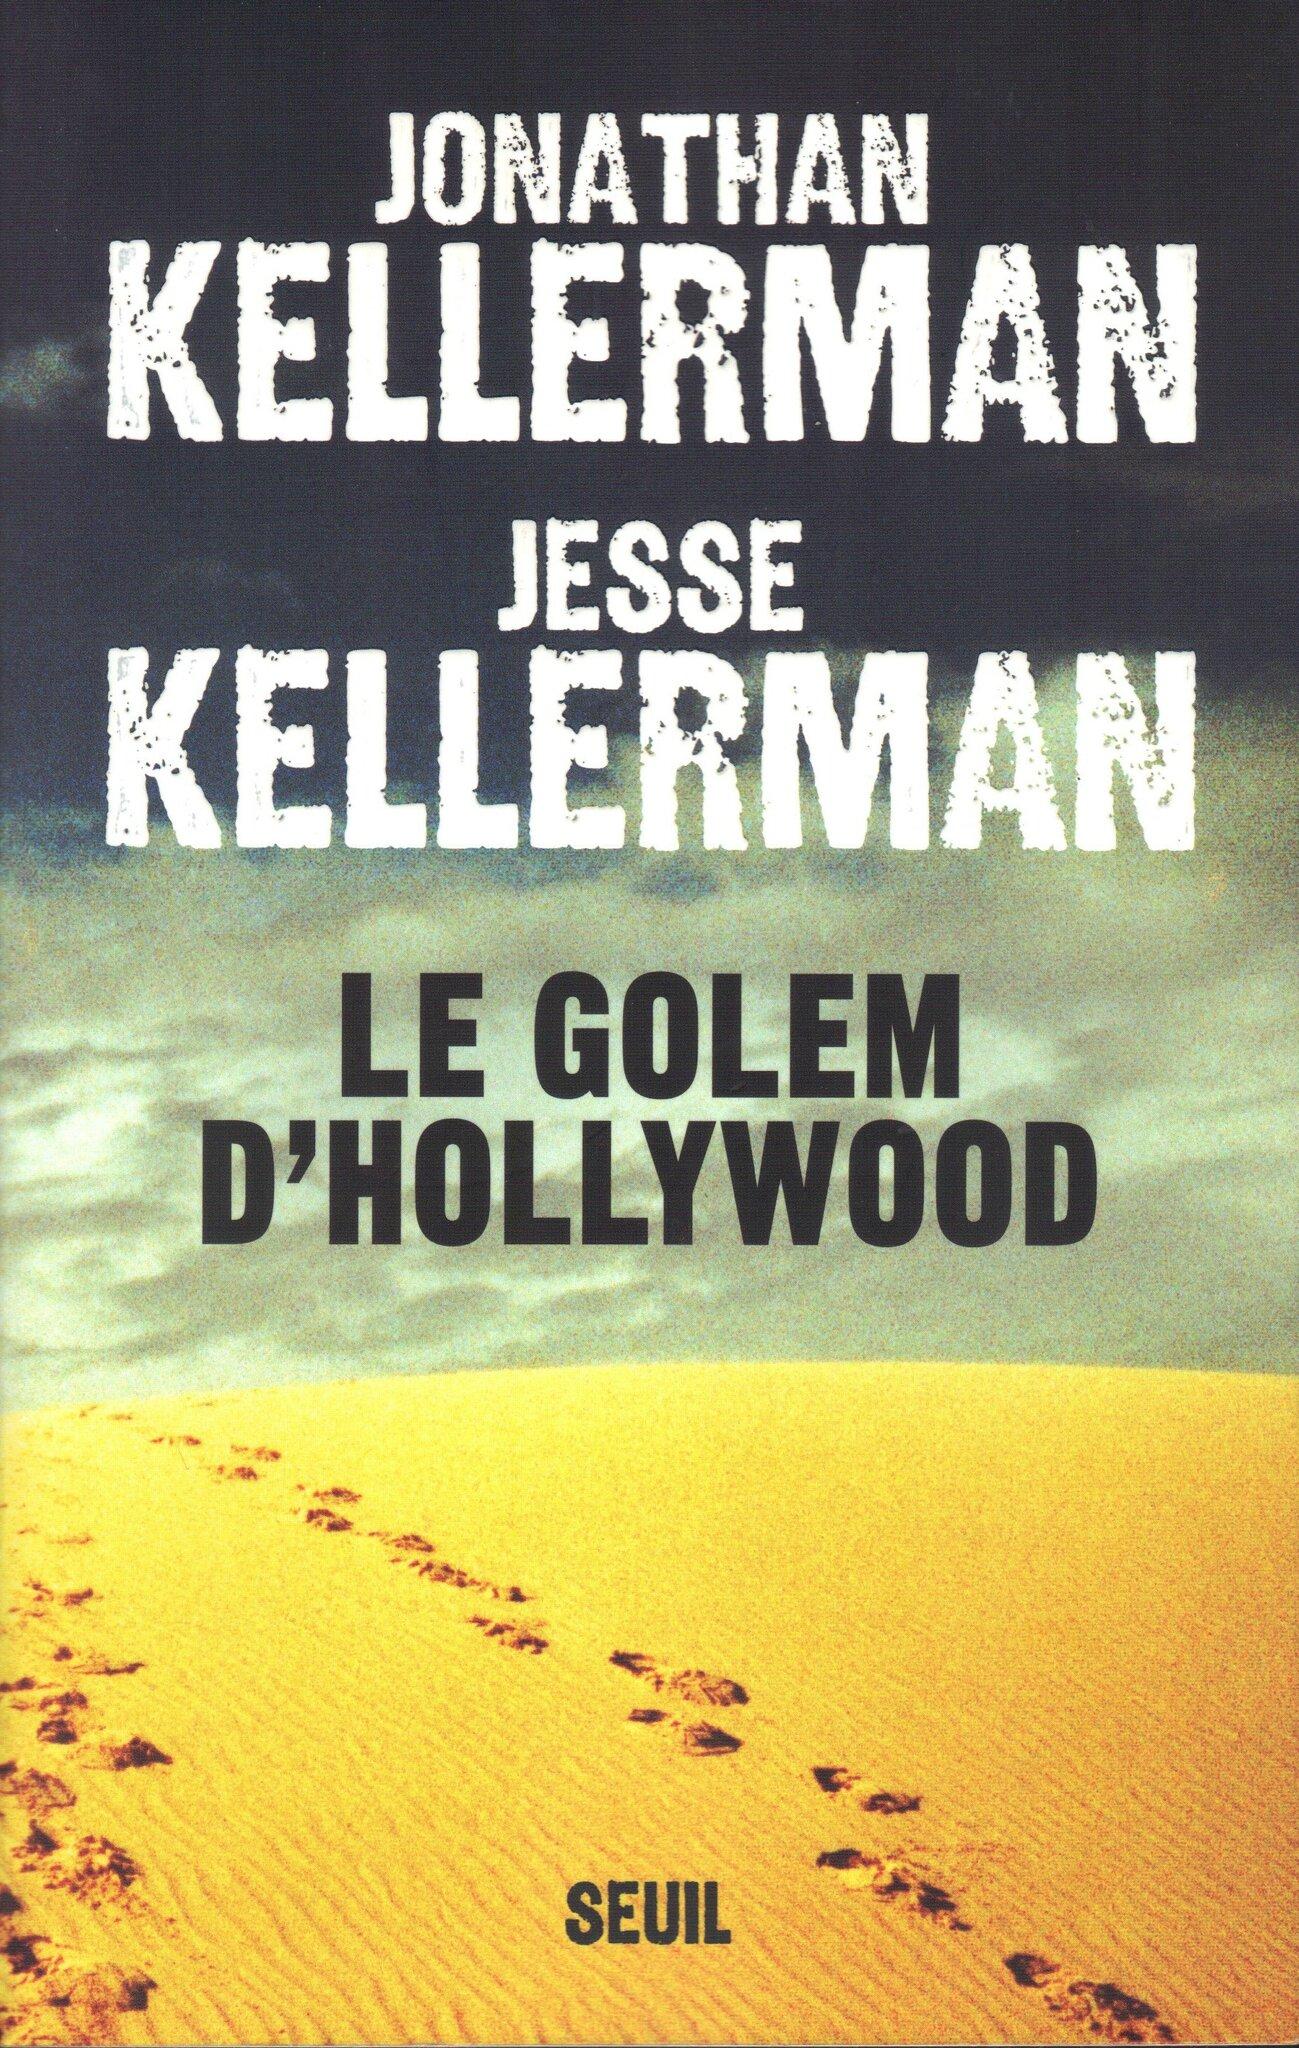 'Le Golem d'Hollywood